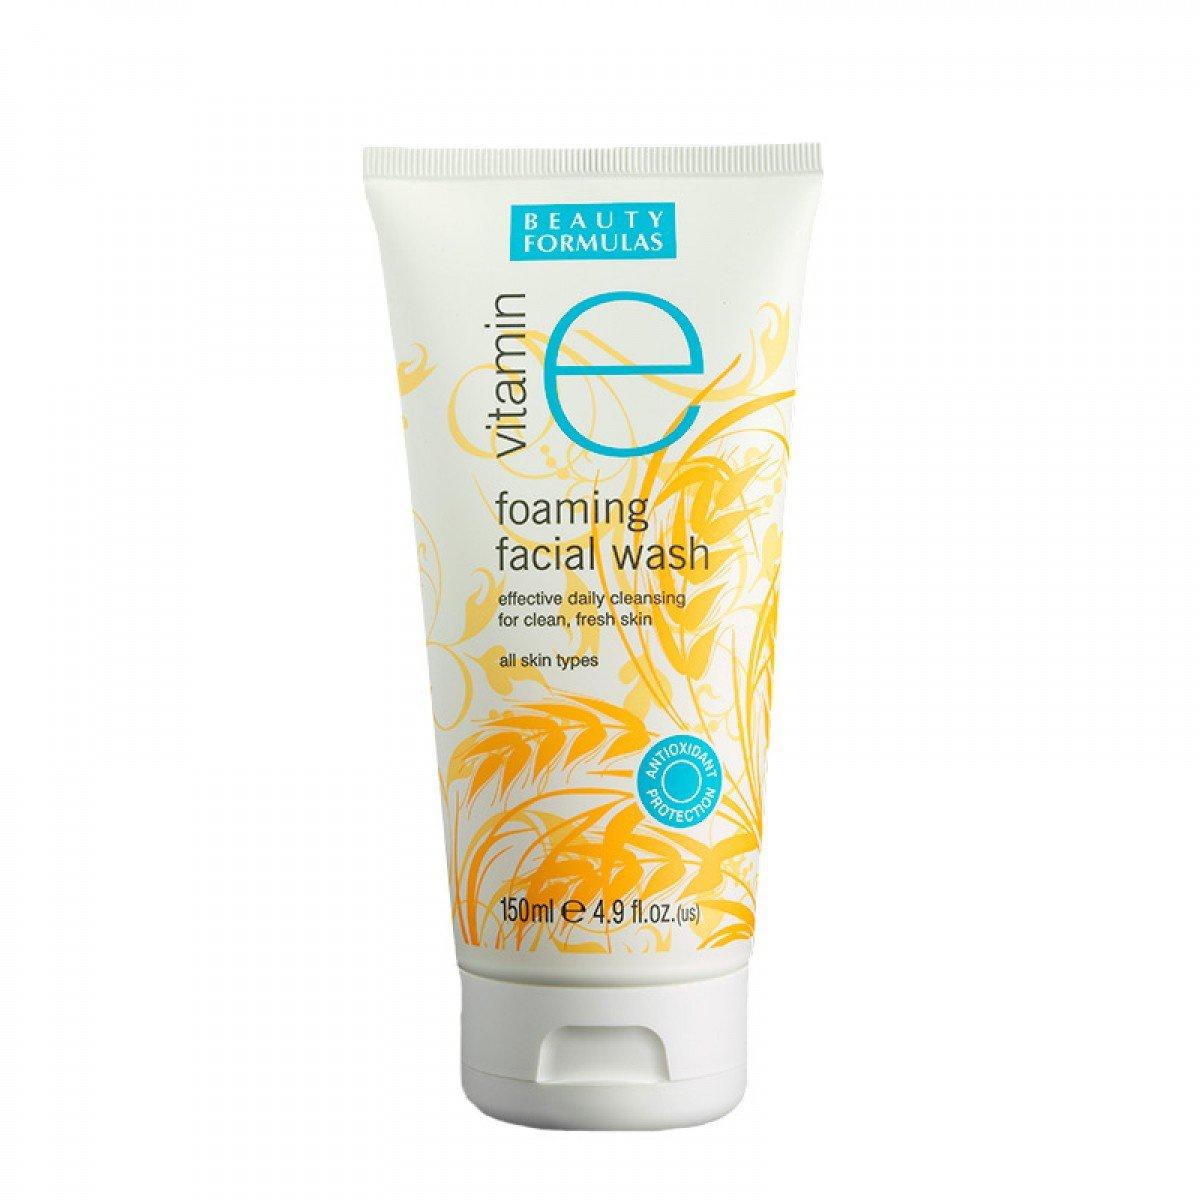 Beauty Formulas Foaming Facial Wash Beauty Formulas Vitamin E